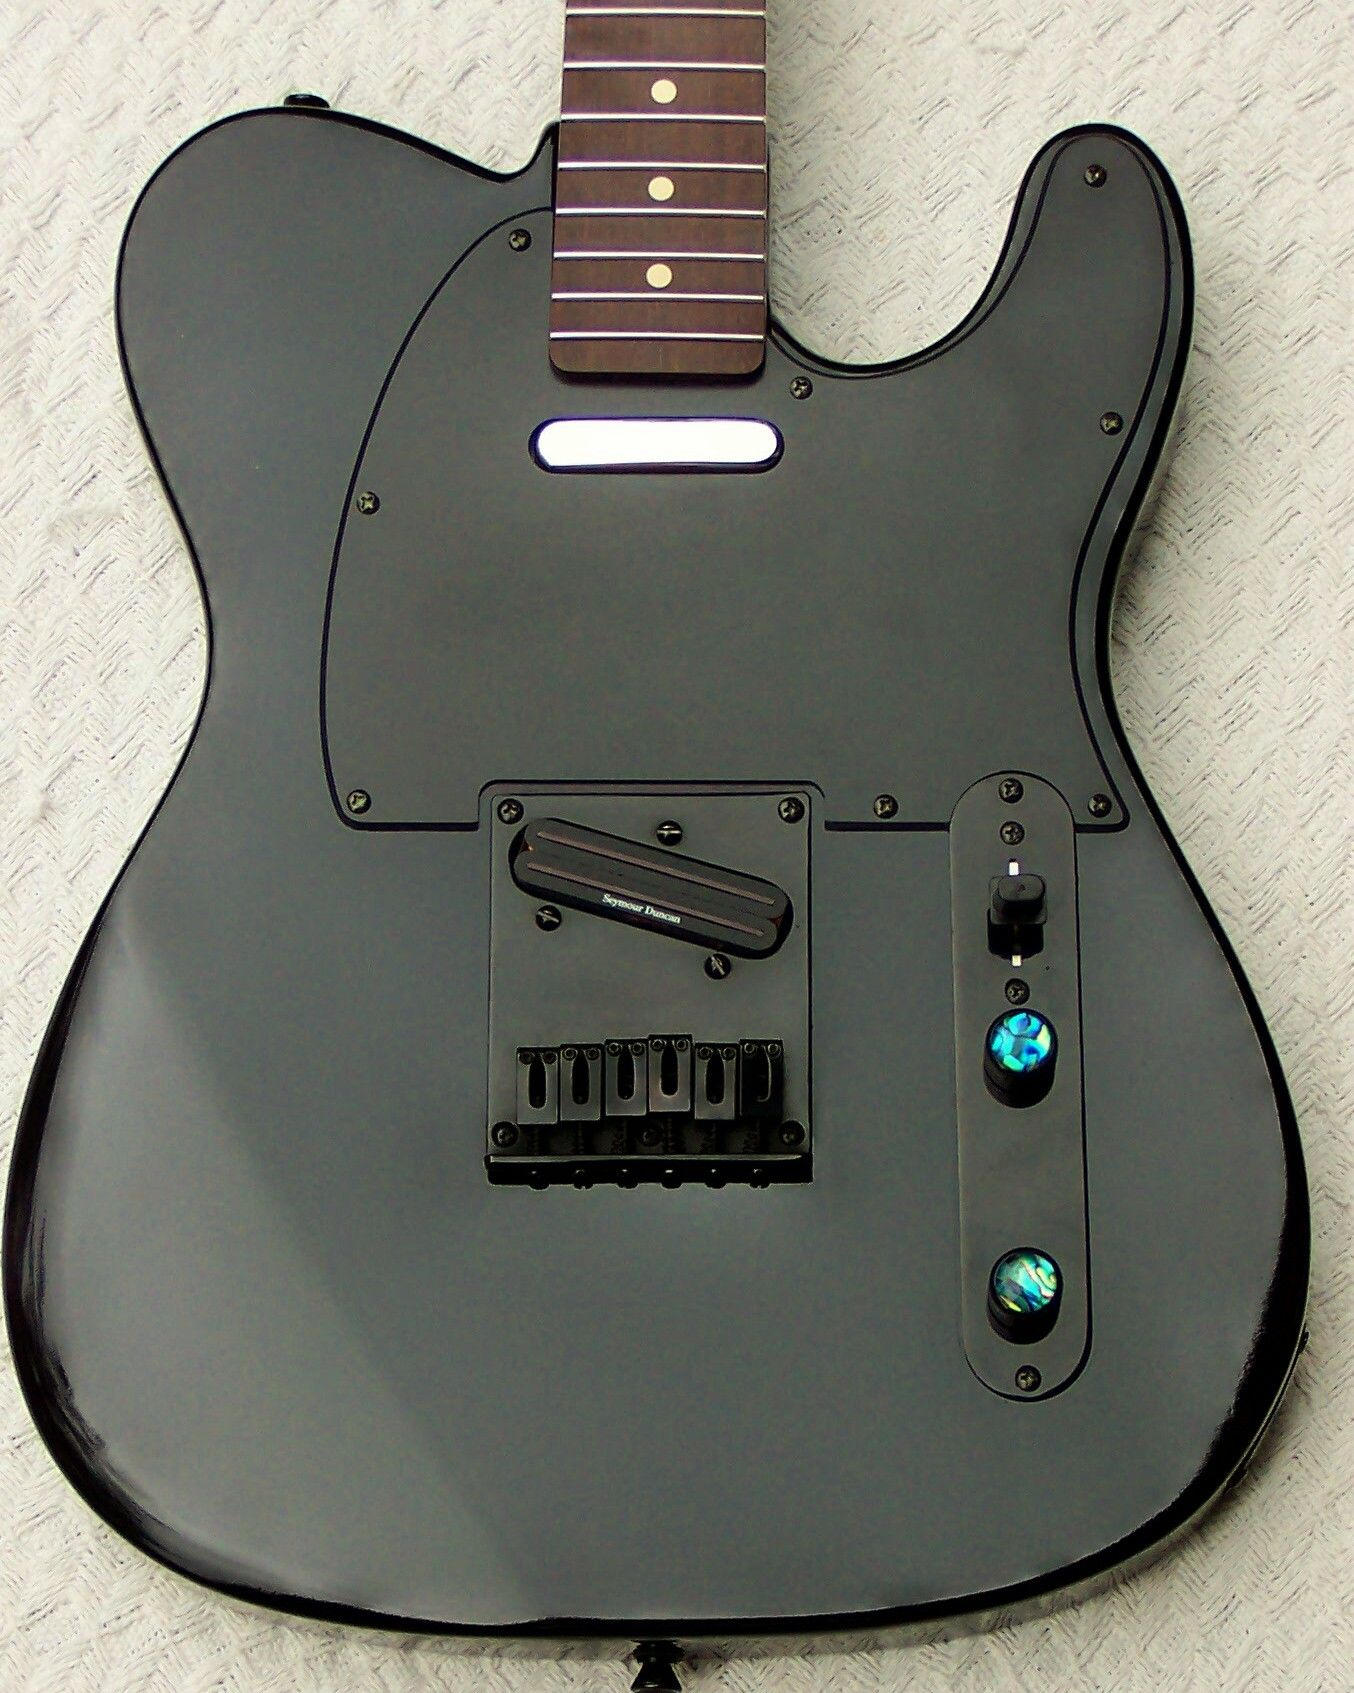 http://www.haywirecustomguitars.com/,Haywire guitars custom shop ...